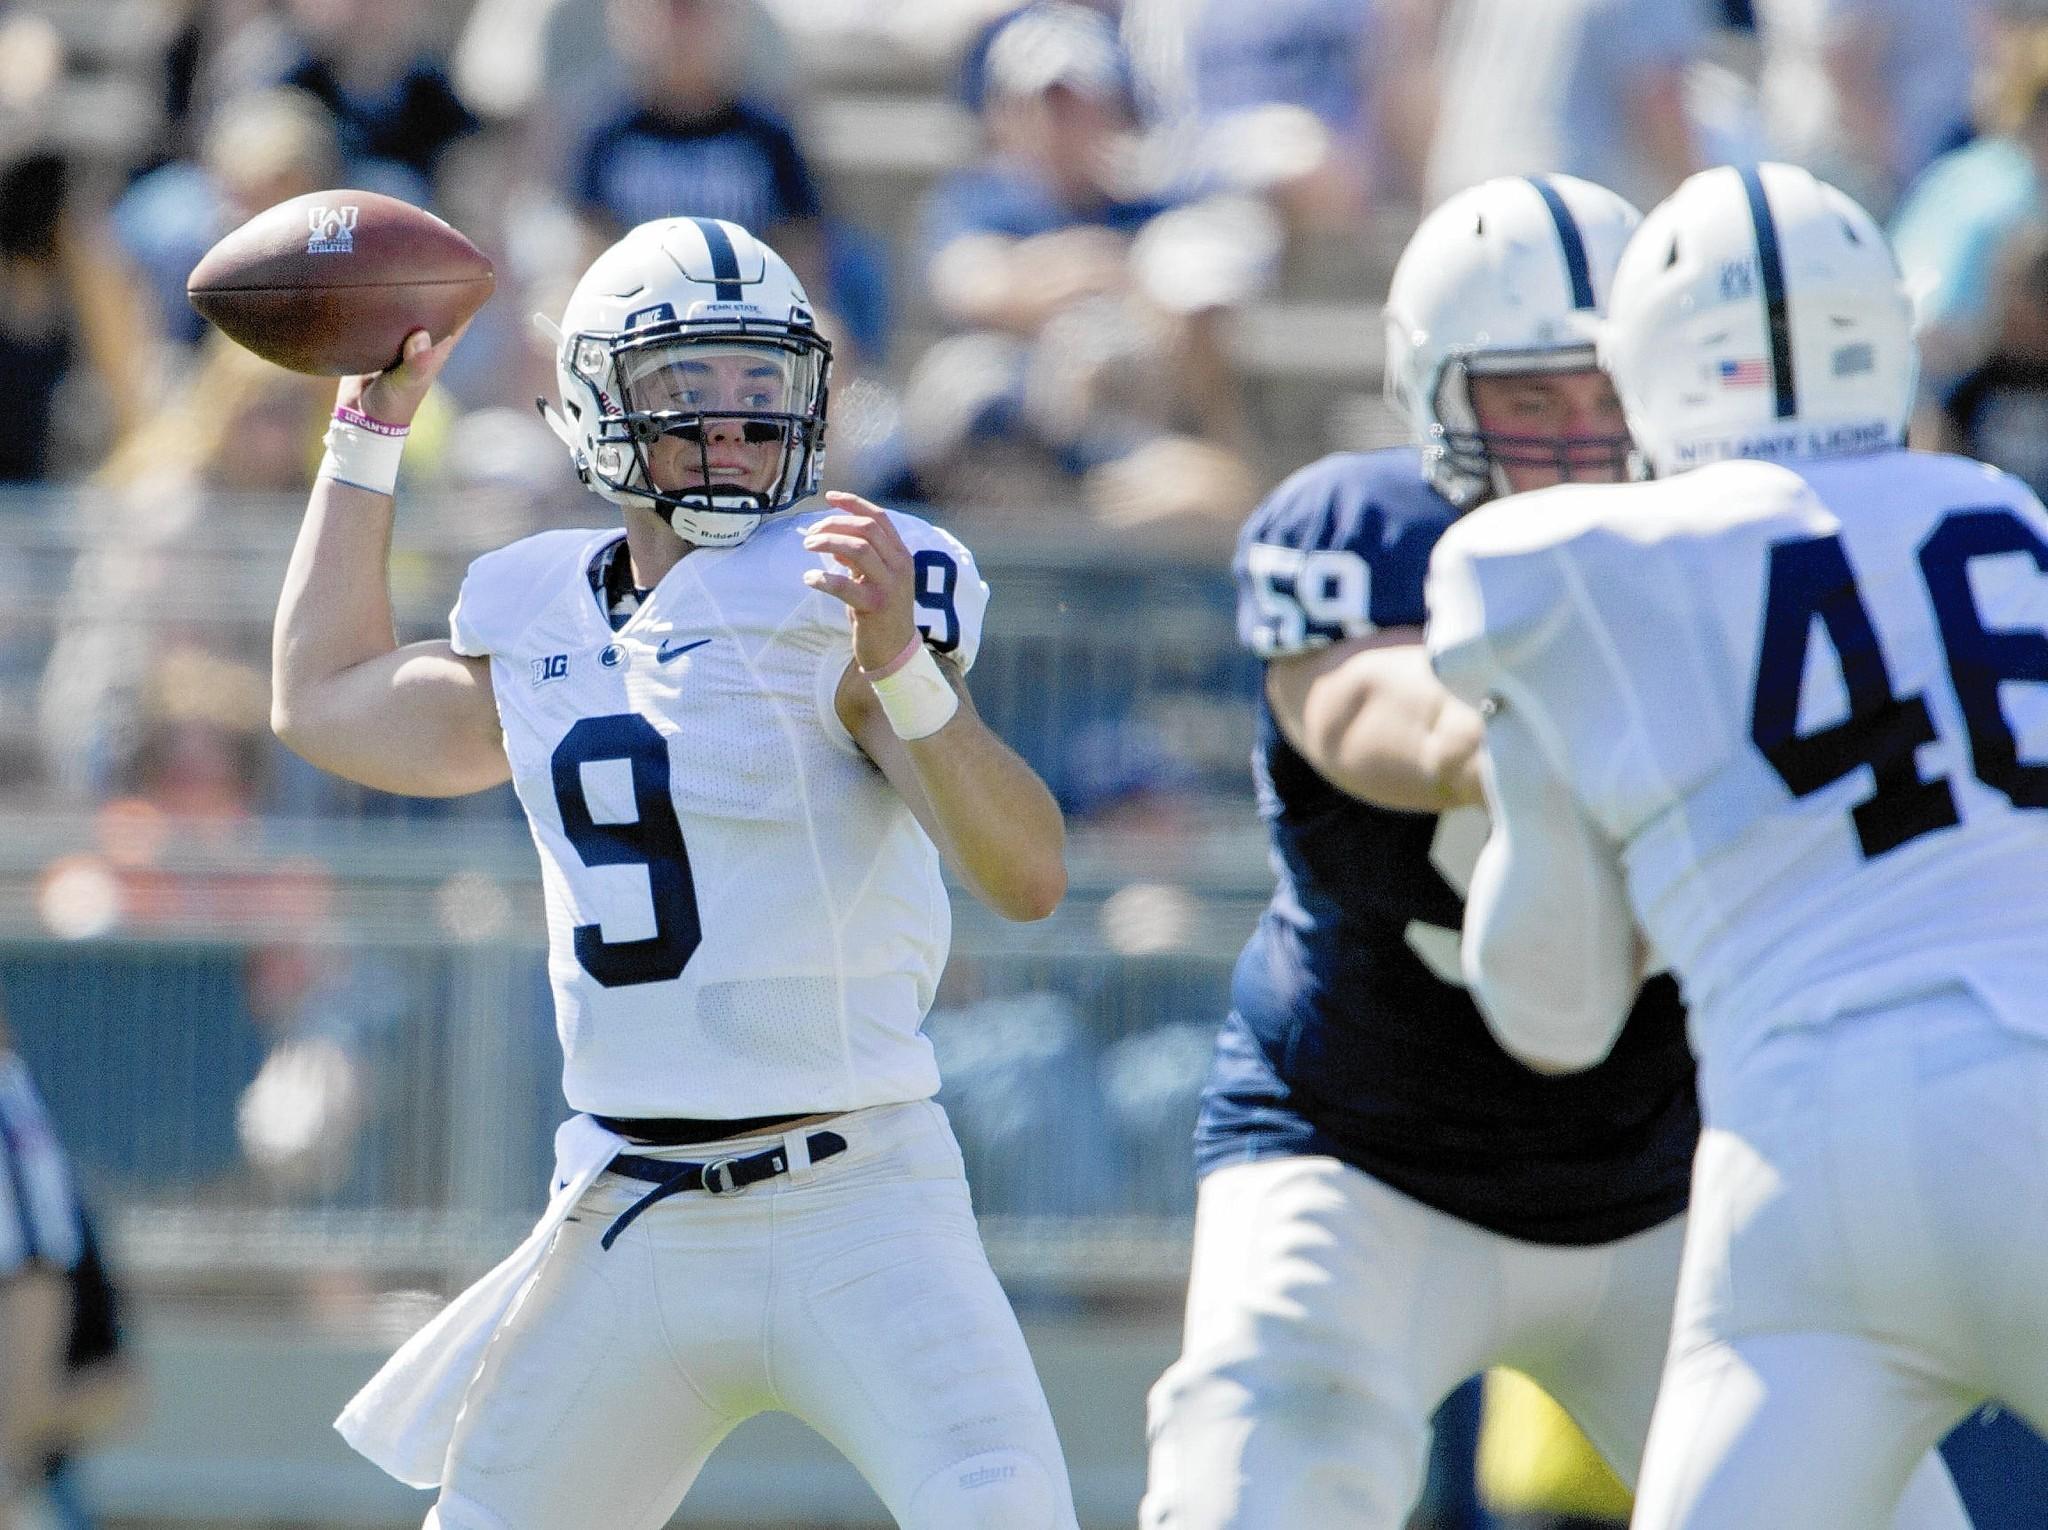 Mc-penn-state-football-quarterback-competition-20160625